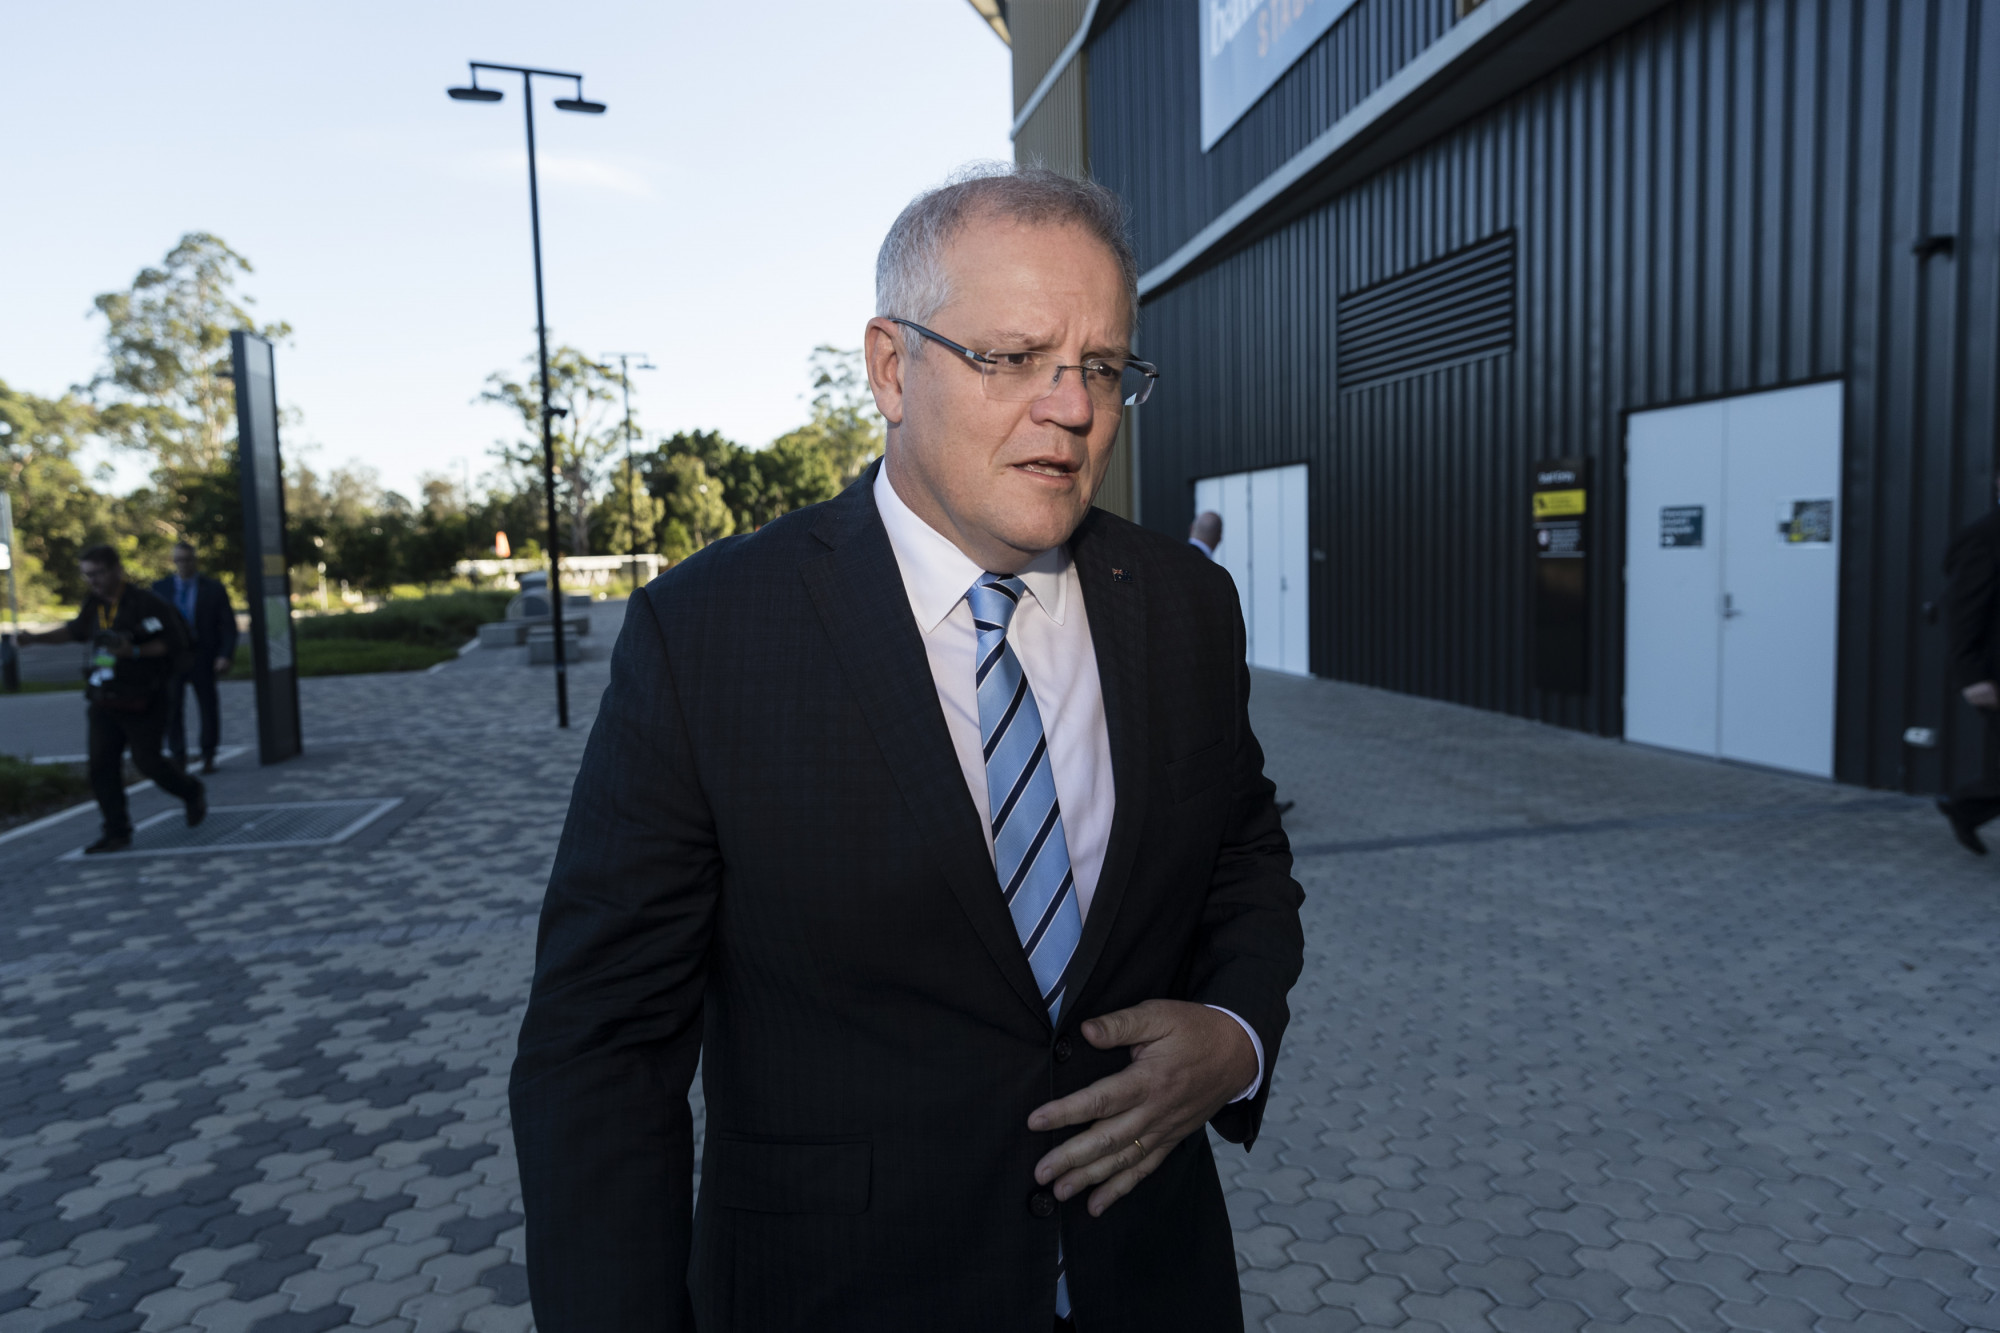 Australian Prime Minister Says 'Stop Hoarding' Amid Coronavirus Pandemic